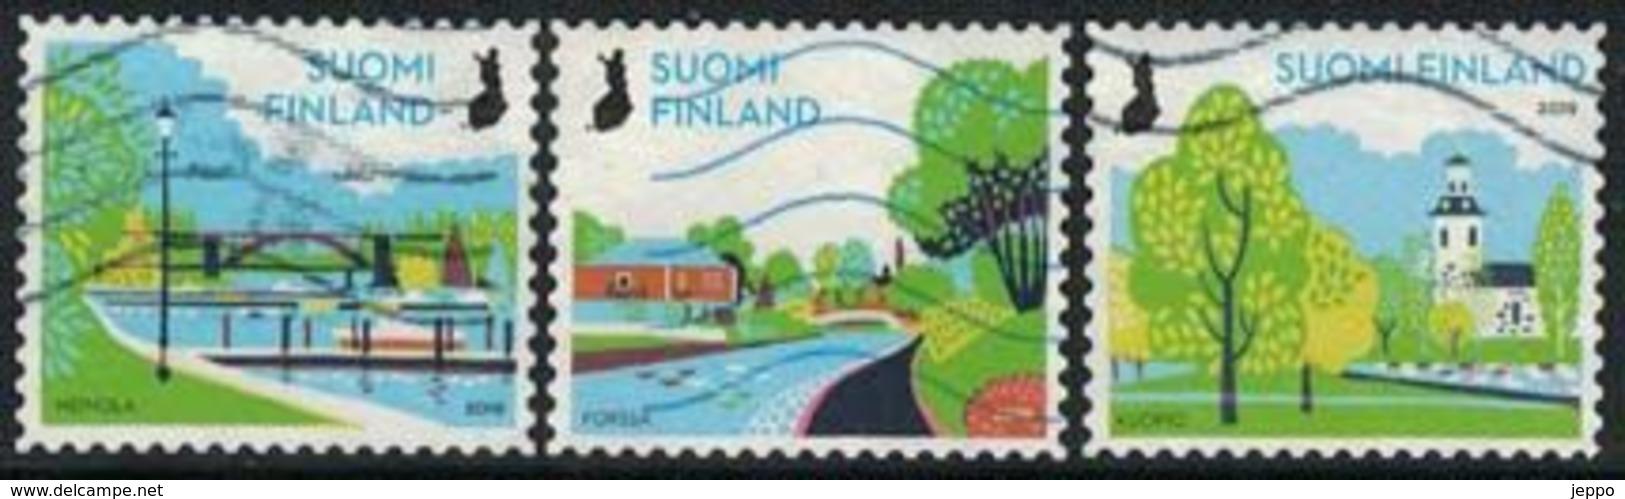 2019 Finland, Rural Parks, Complete Used Set. - Gebruikt